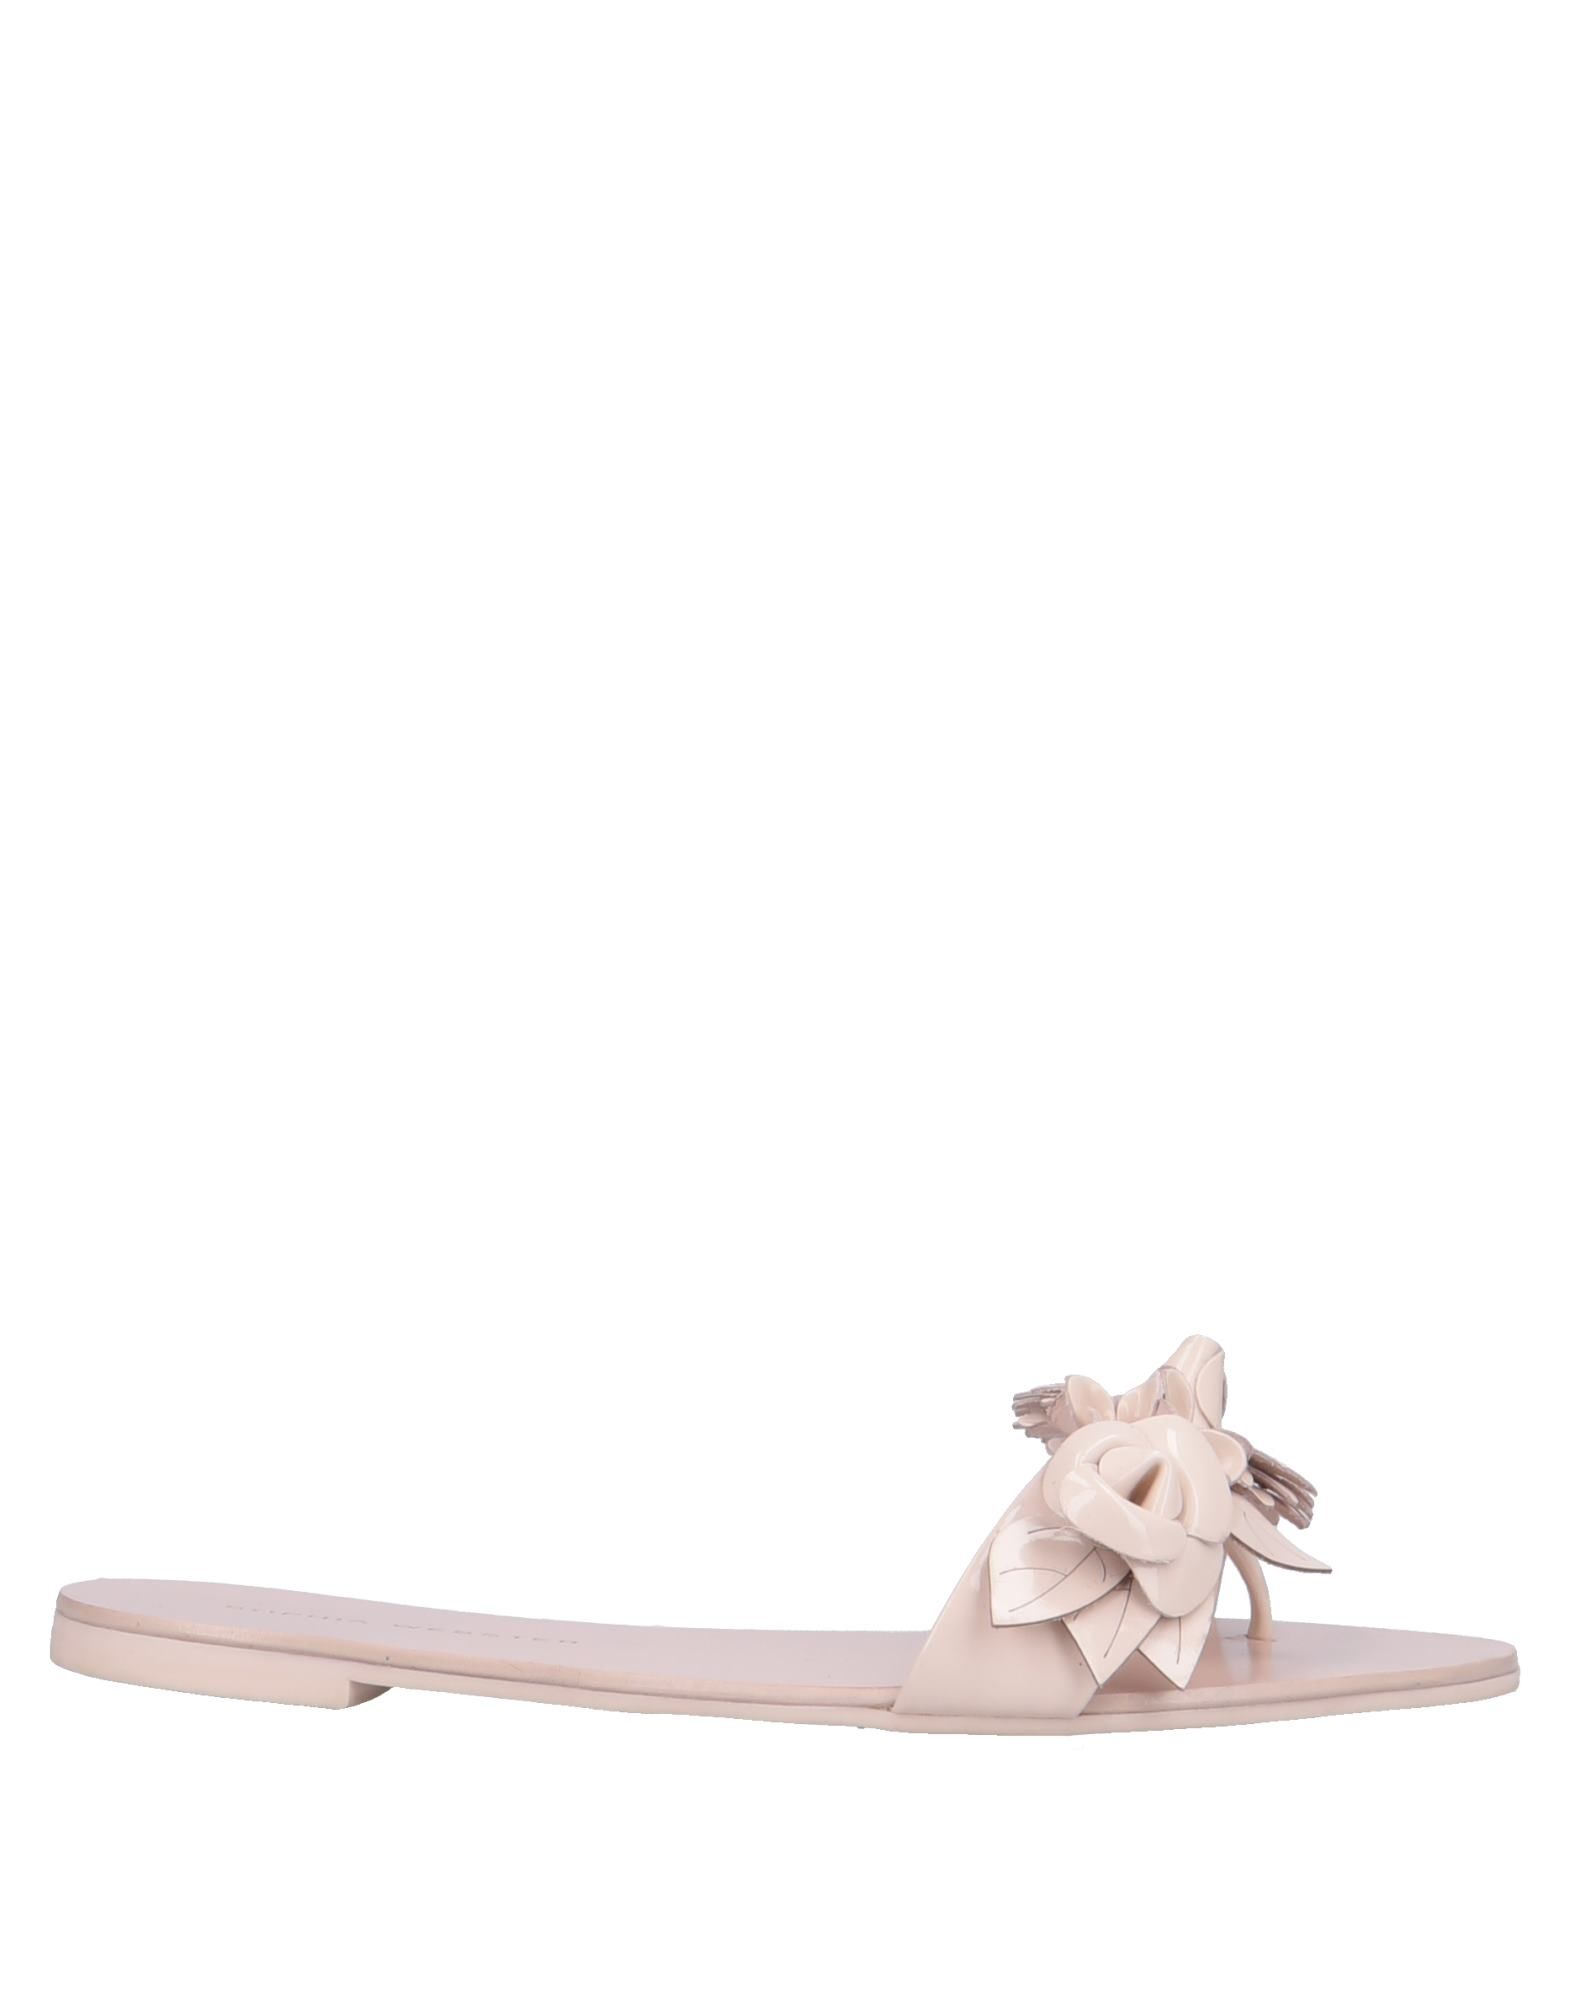 Sophia Webster Dianetten Damen  11328837CFGut aussehende strapazierfähige Schuhe